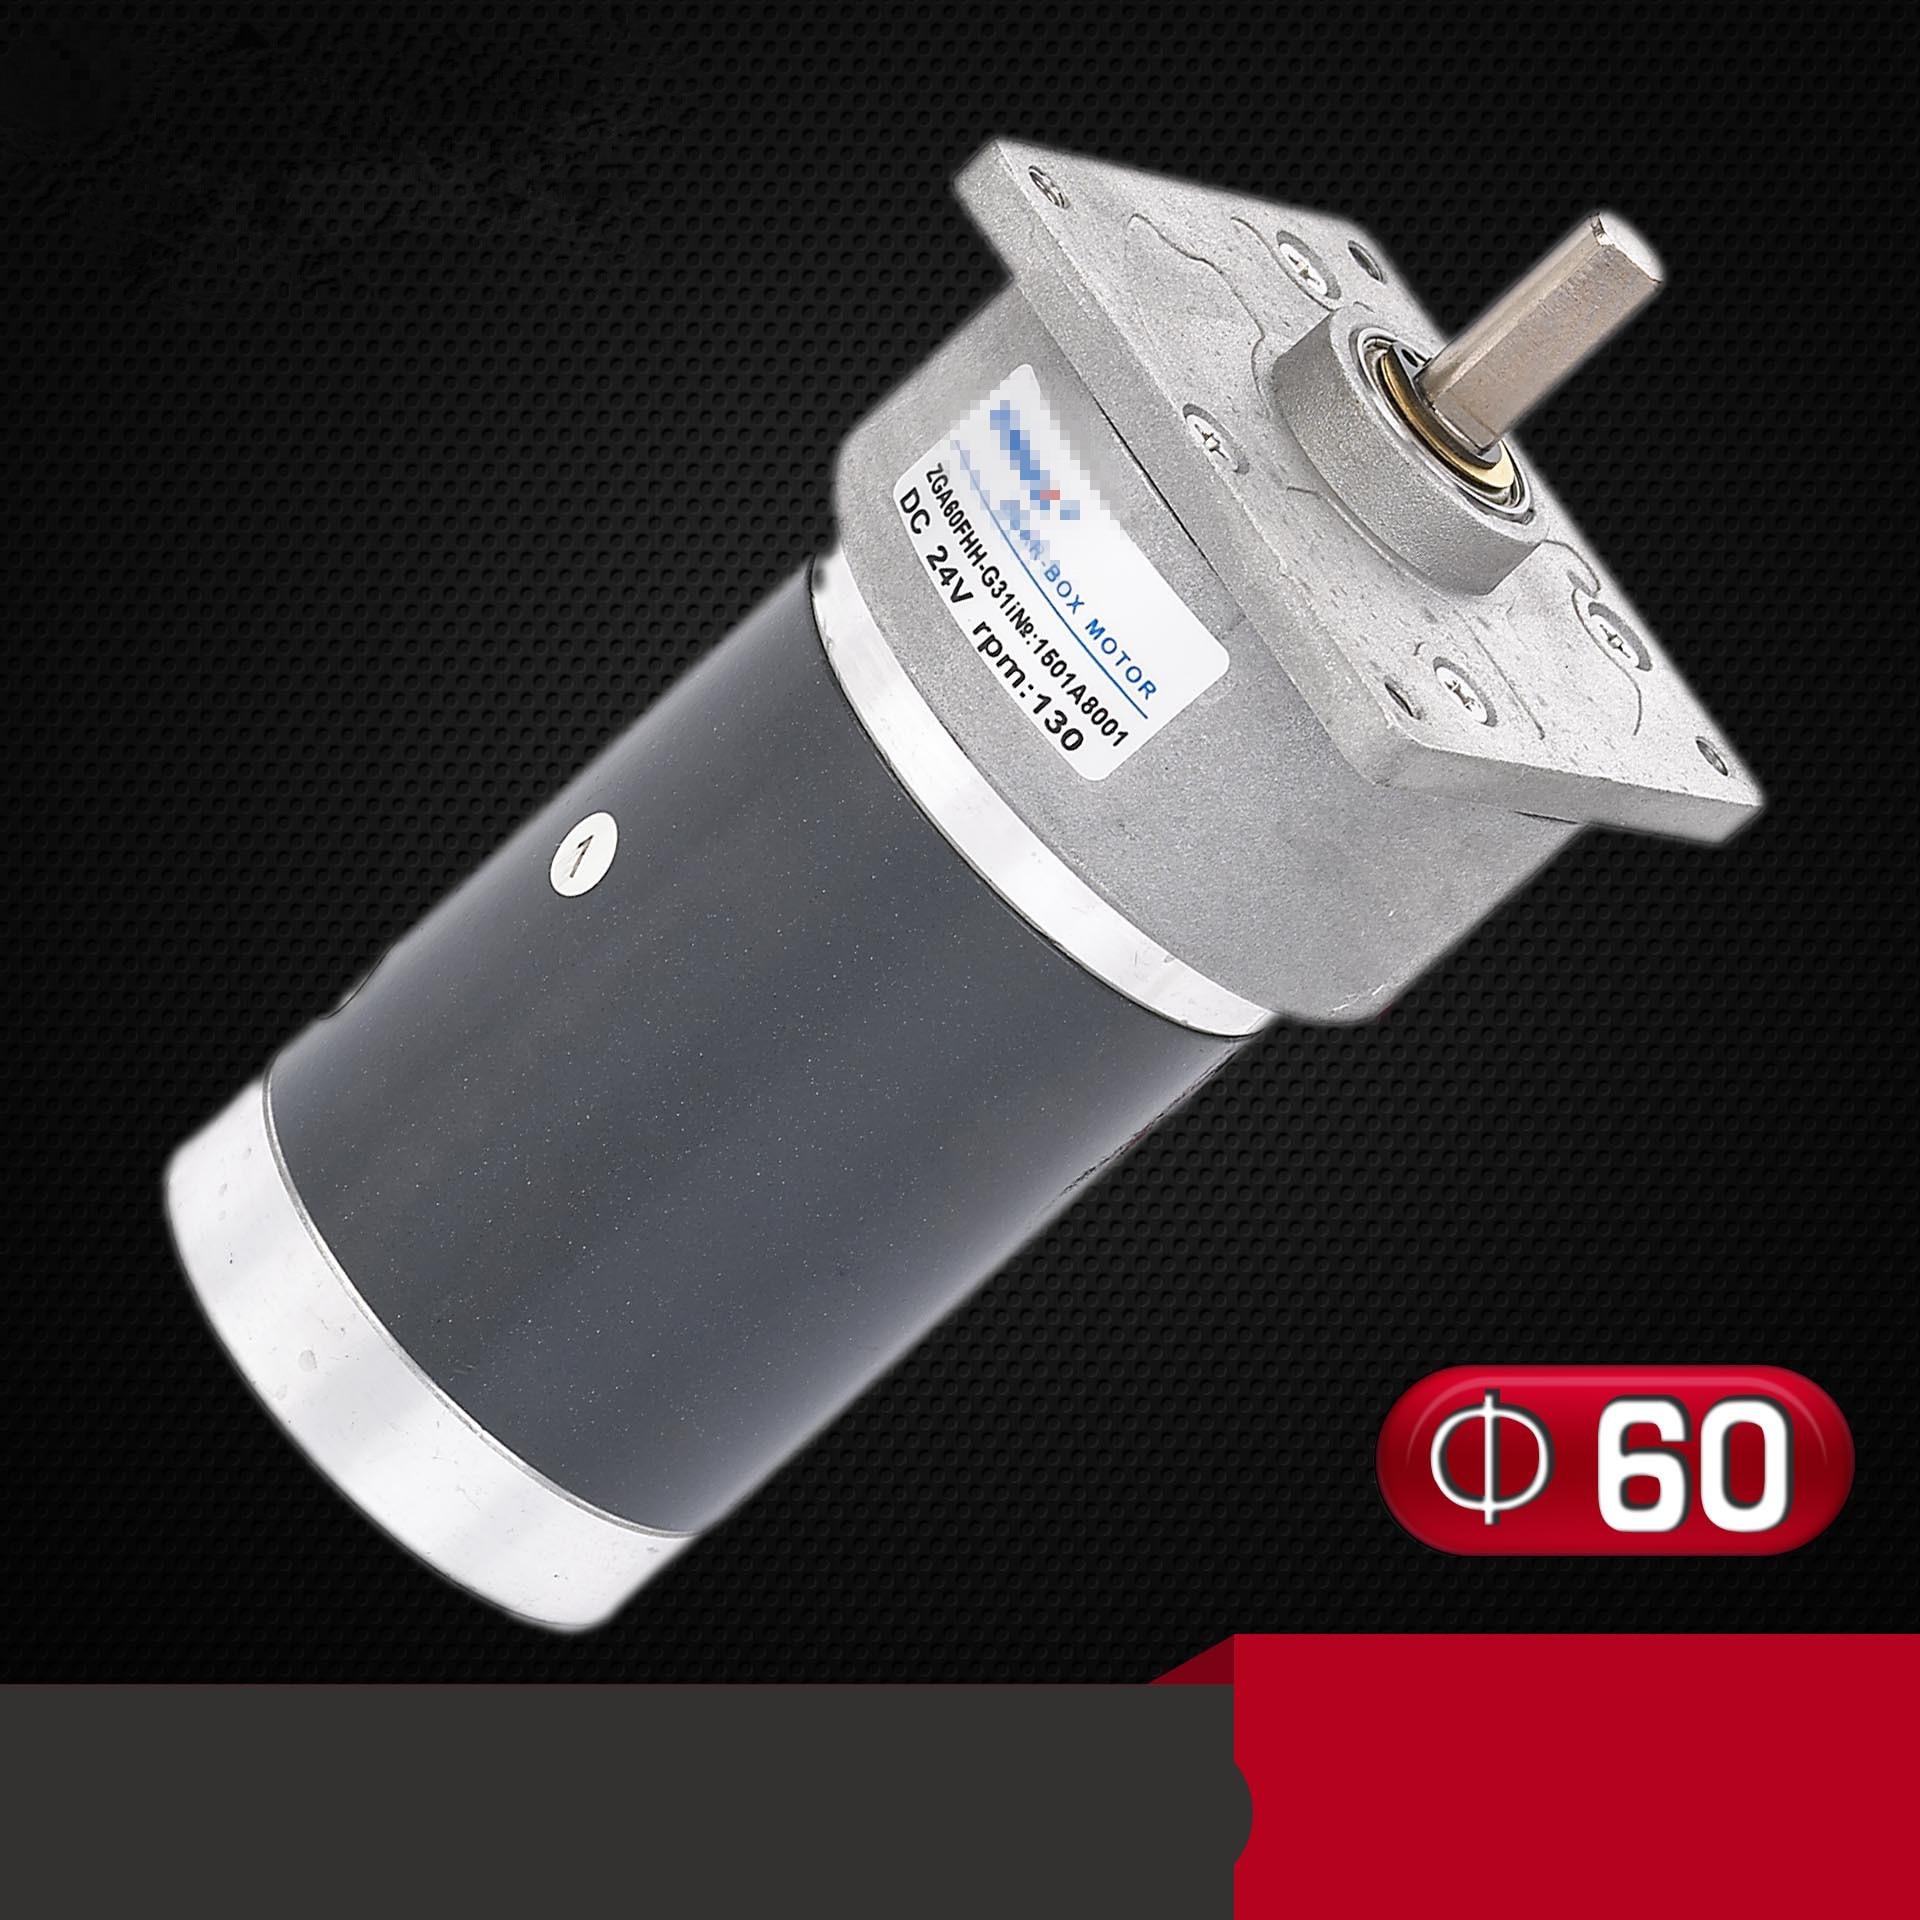 ZGA60FHH-G motoréducteur 60mm Miniature DC motoréducteur 12 V 24 V arbre de sortie 10 tr/min-1000 tr/min